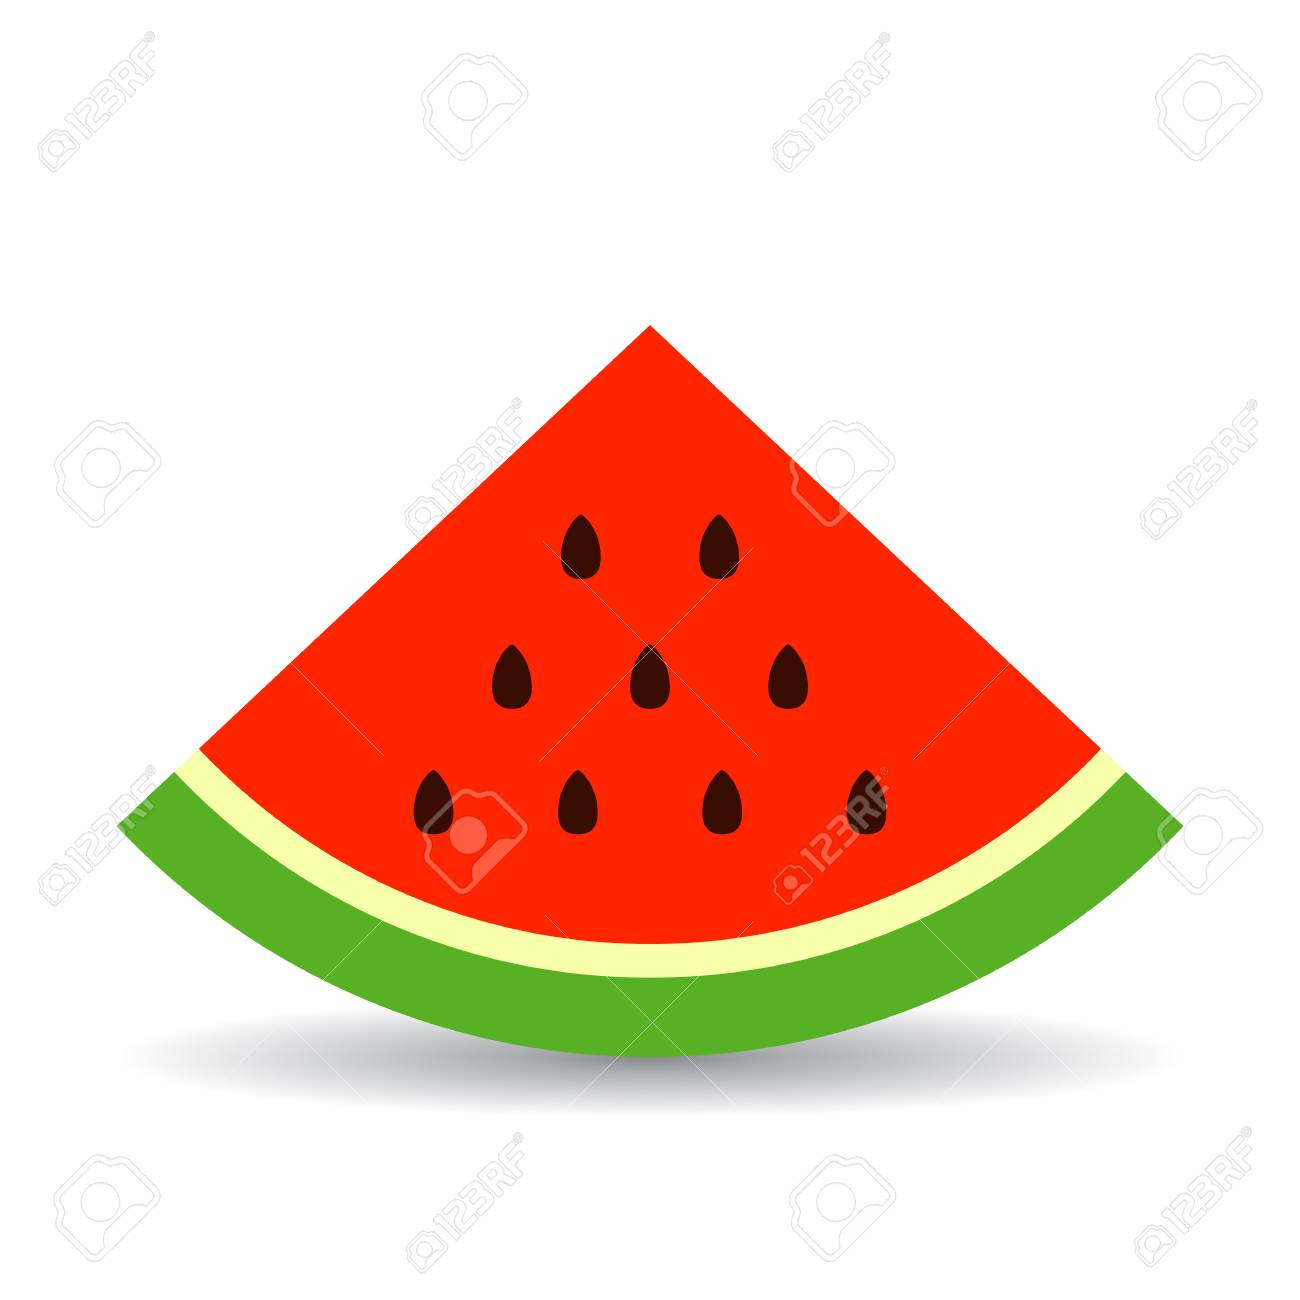 triangle piece of watermelon vector icon royalty free cliparts rh 123rf com watermelon vector black and white watermelon vectorial